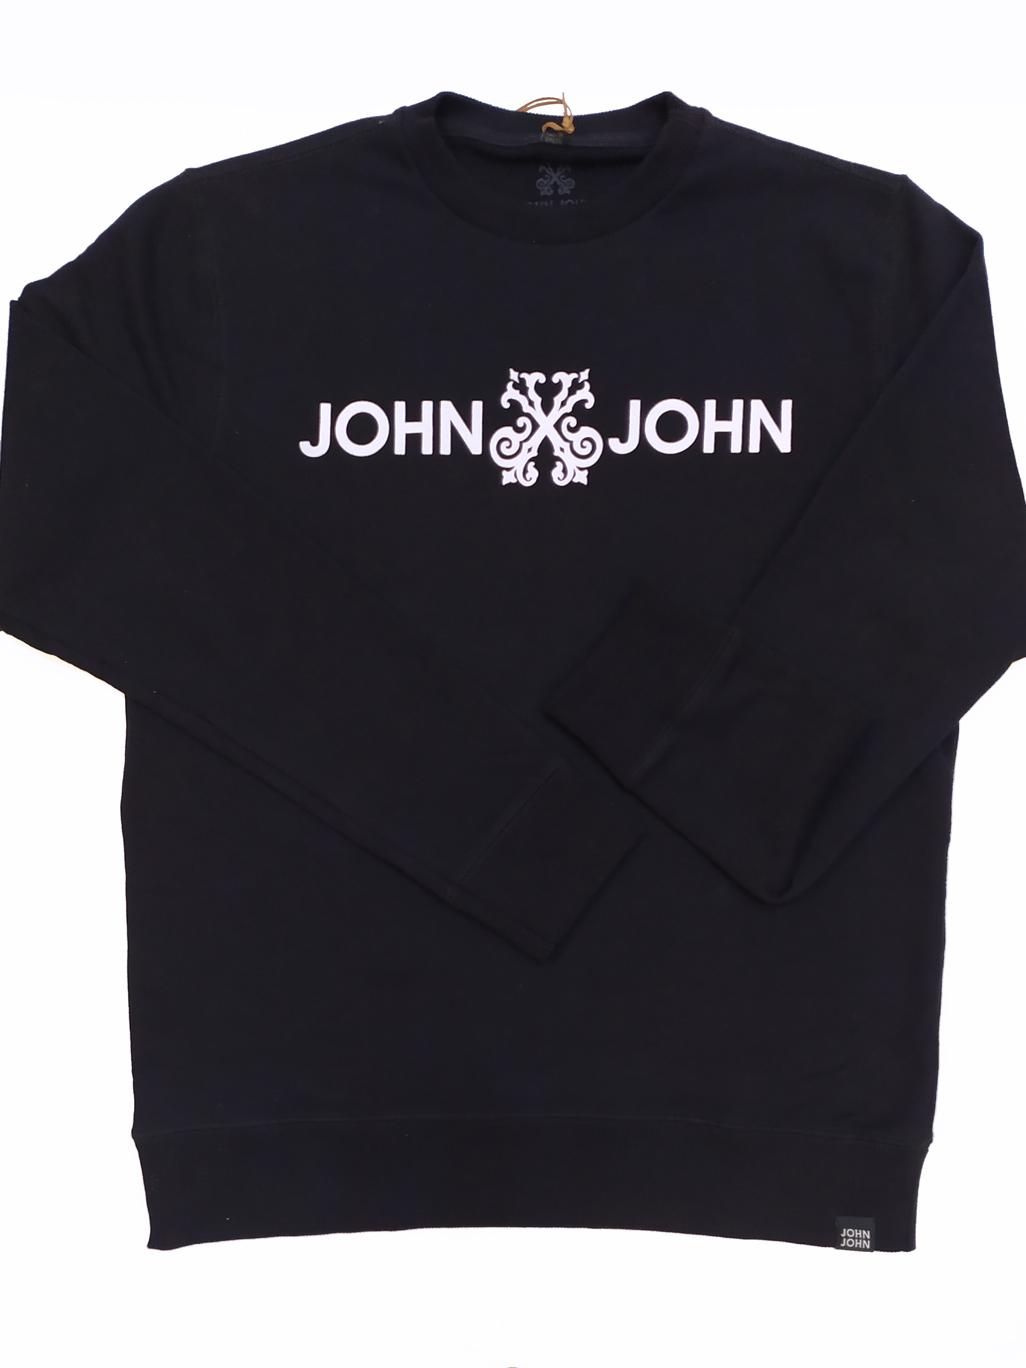 Casaco Moletom Masculino JOHN JOHN